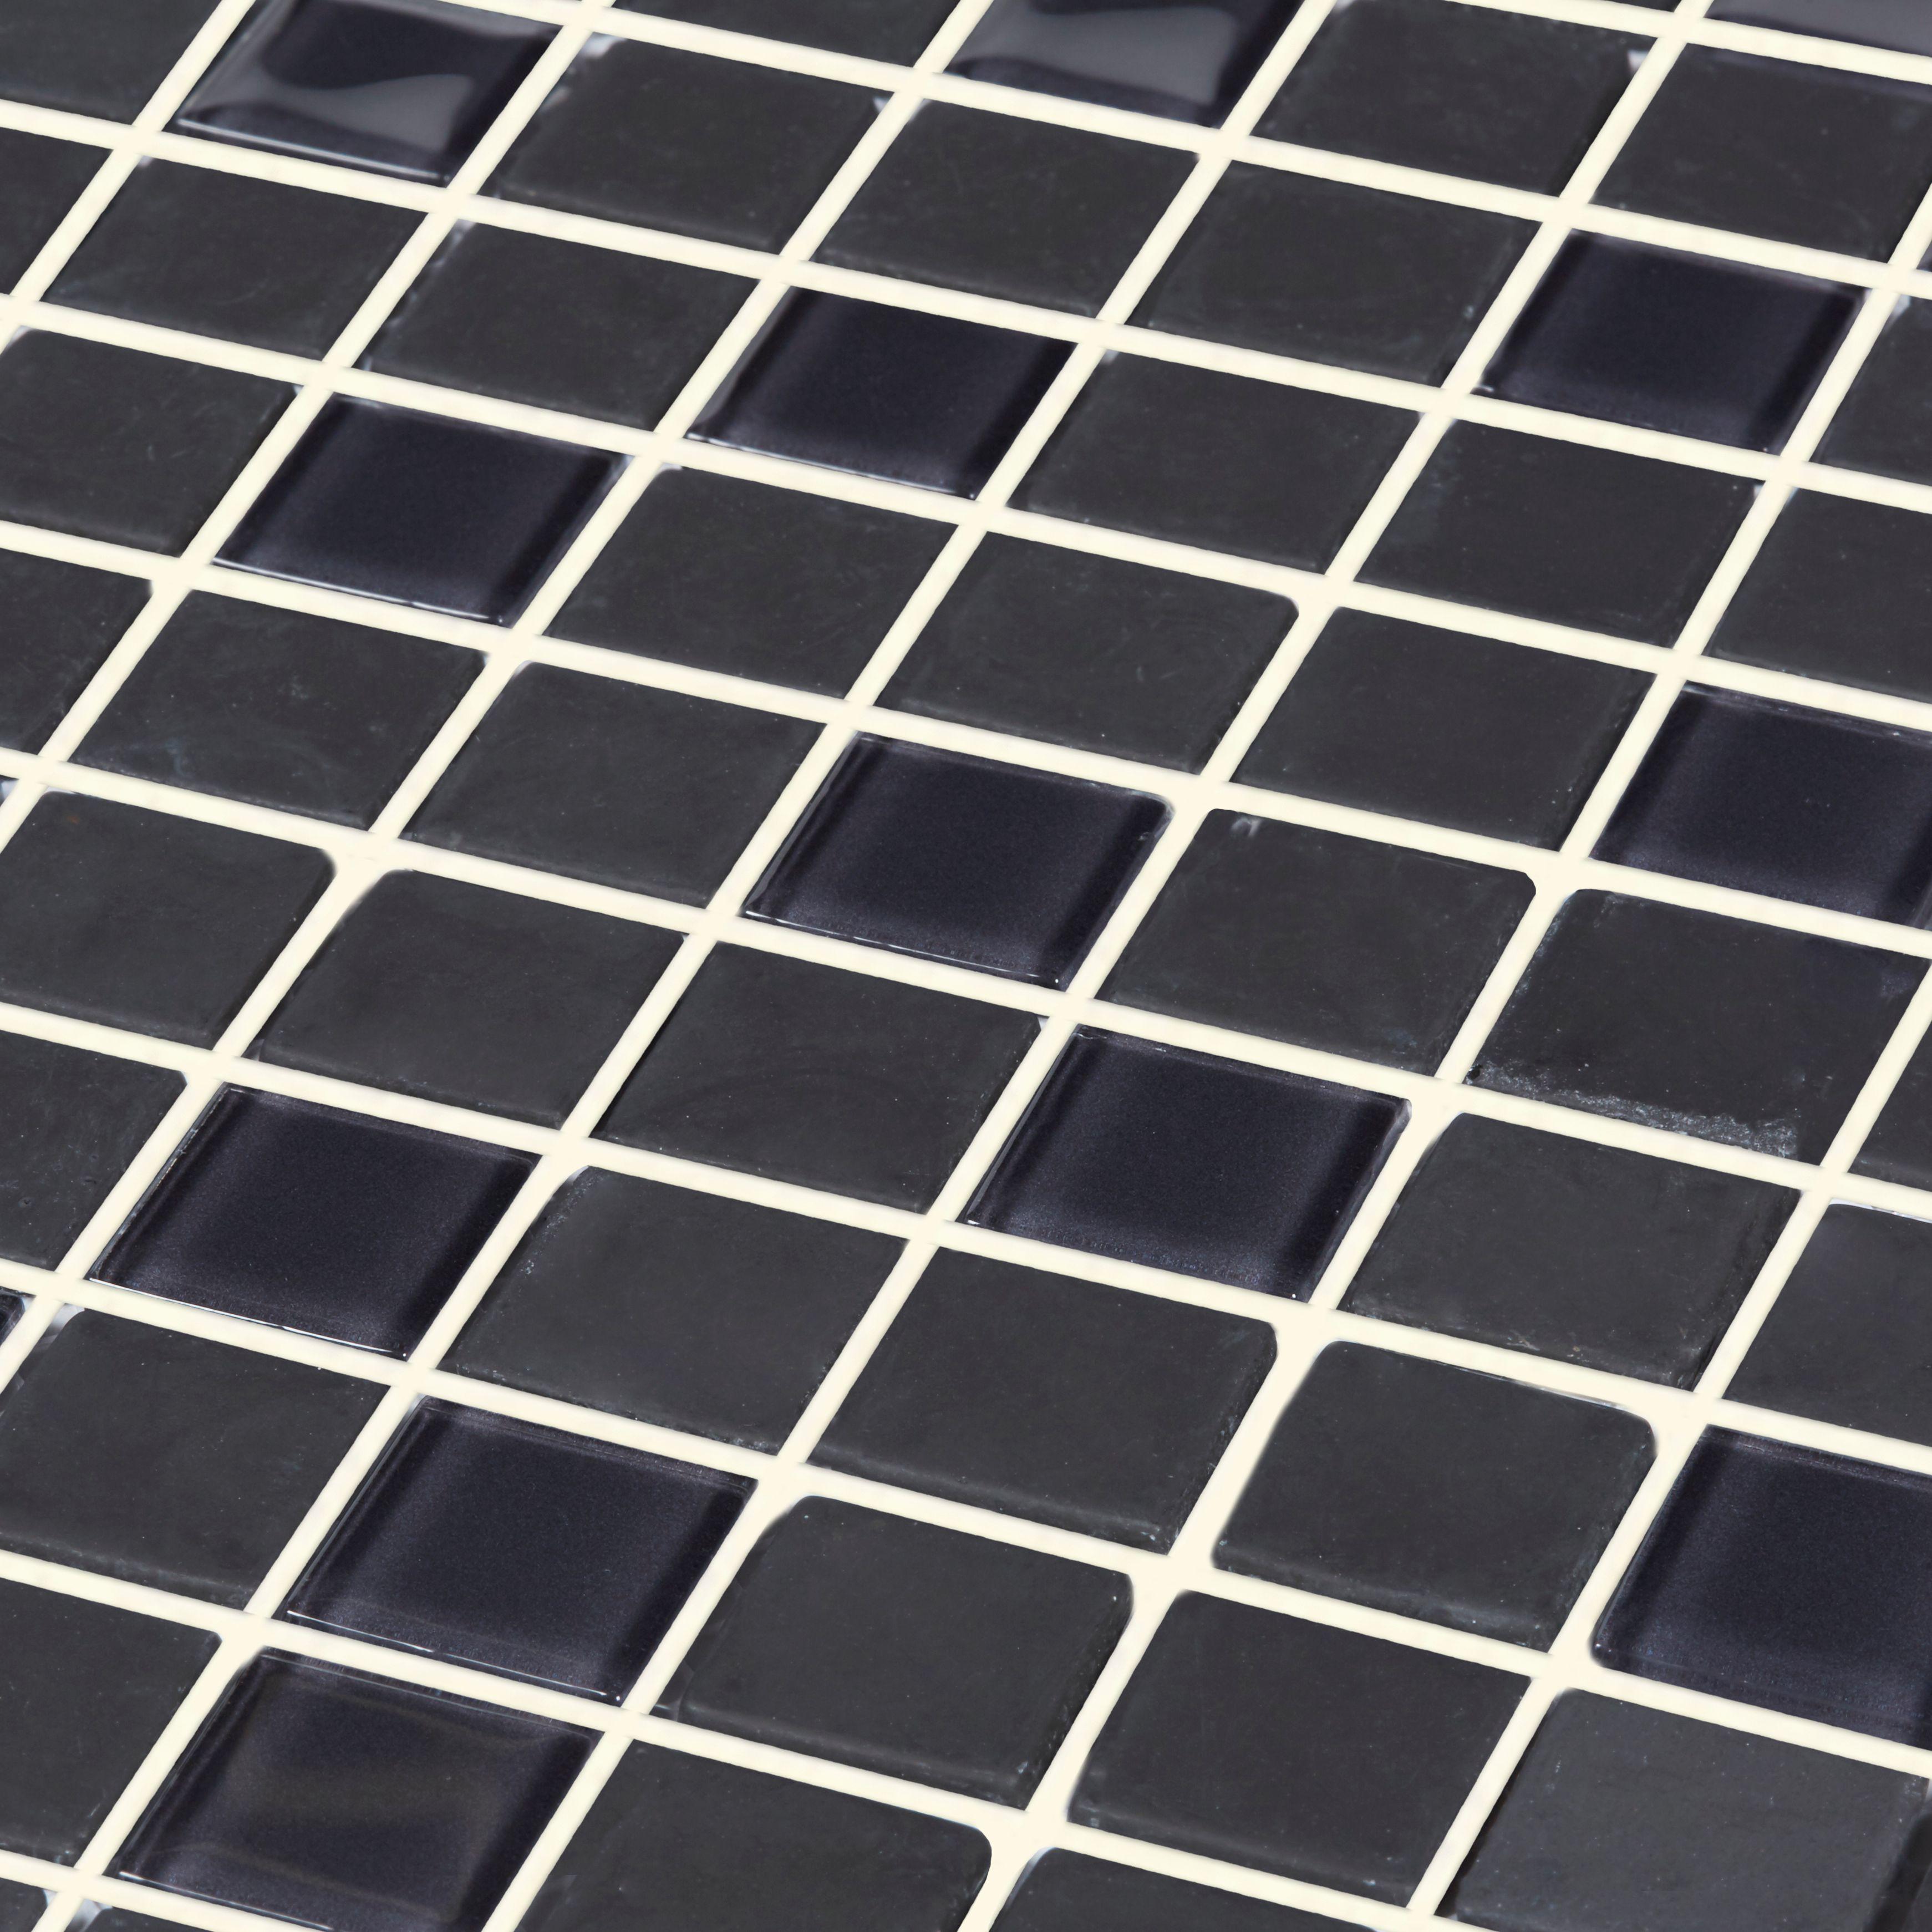 genovia black grey glass effect mosaic glass mosaic tile l 295mm w 295mm